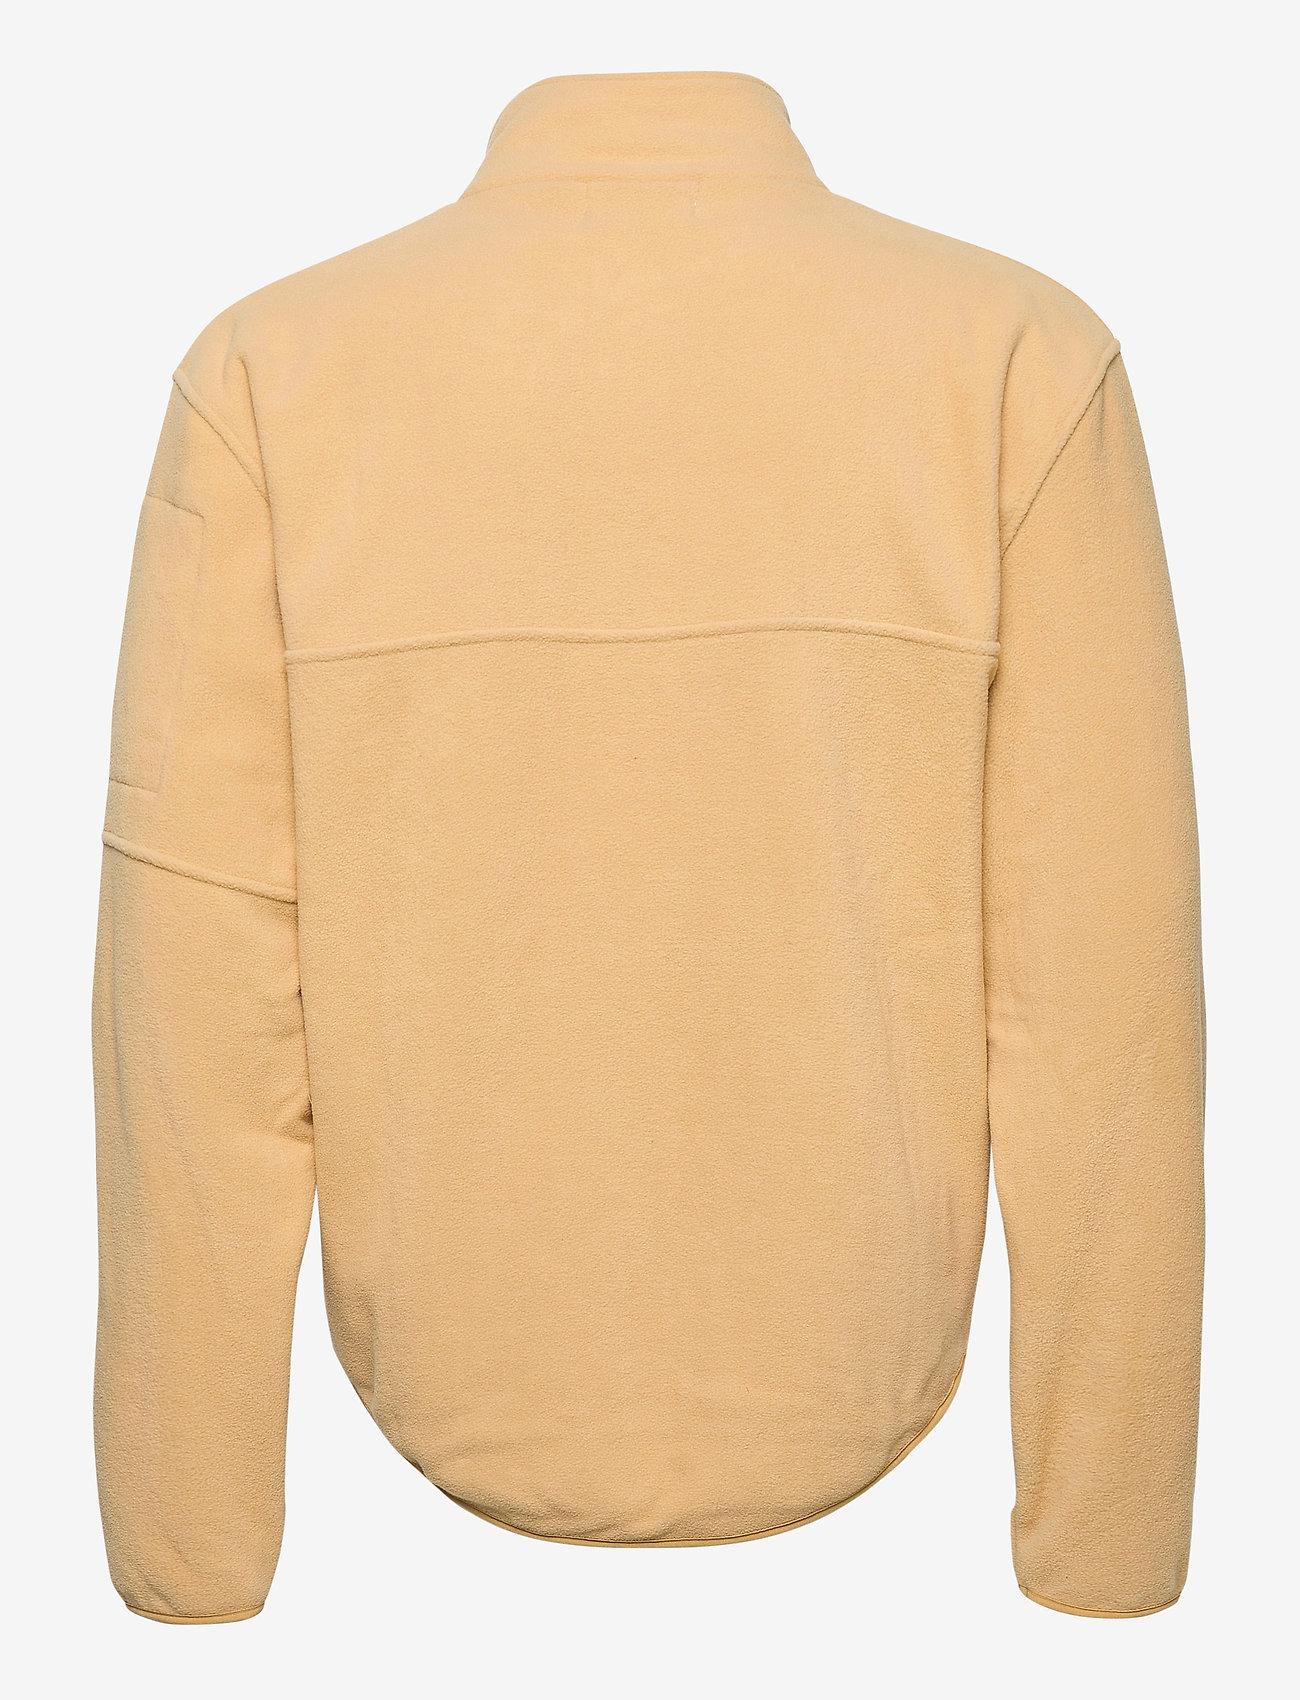 Resteröds - PULLOVER RECYCLED POLYESTER - basic-sweatshirts - brun - 1